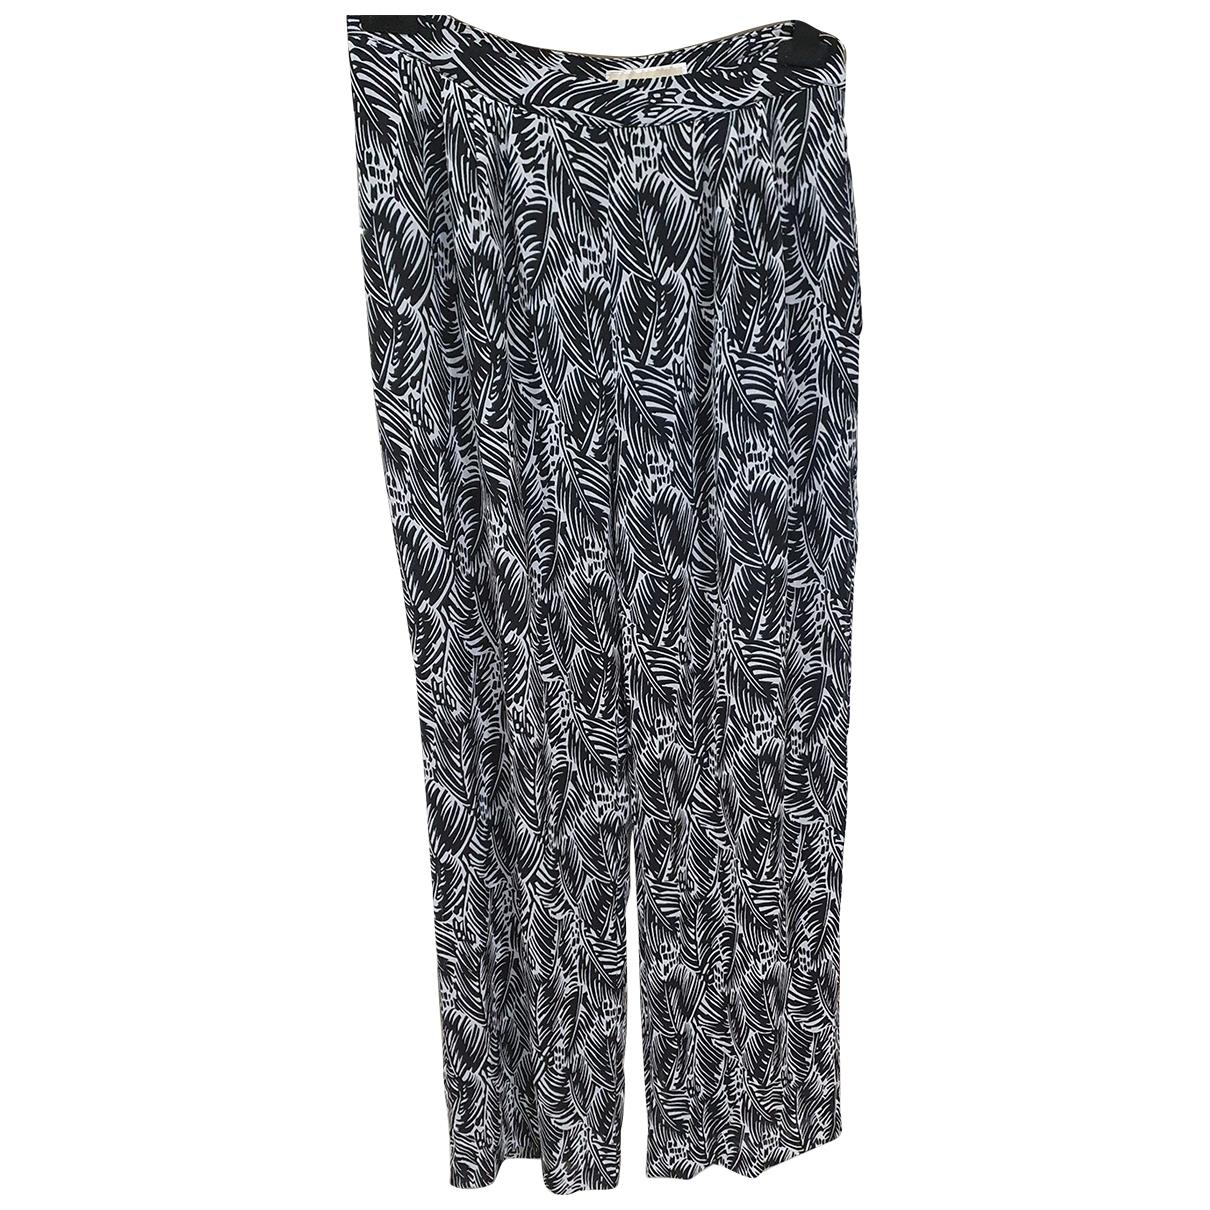 Michael Kors \N Black Trousers for Women L International